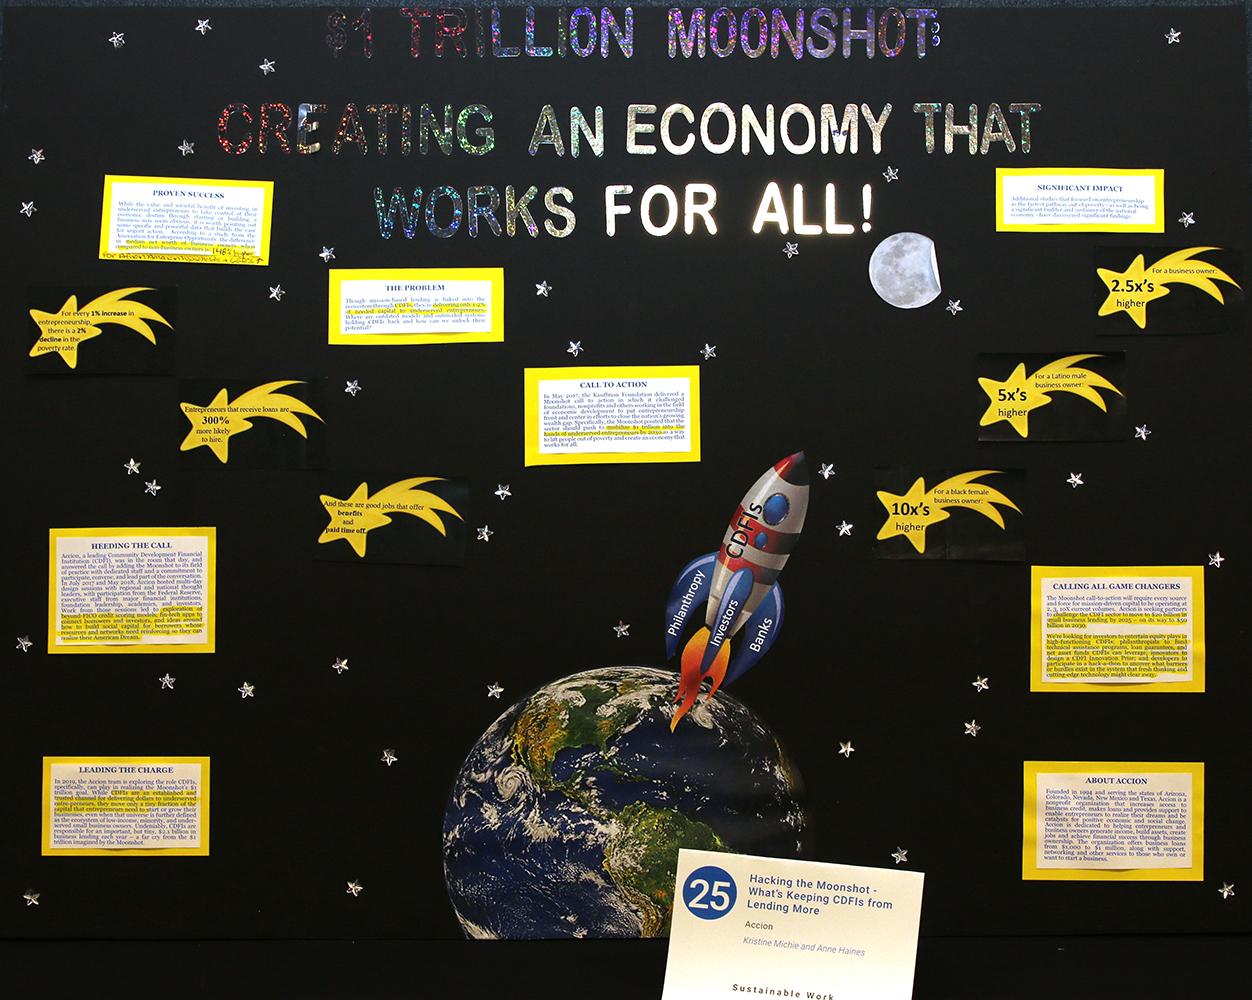 Hacking the Moonshot, Science Fair | ESHIP Summit 2019